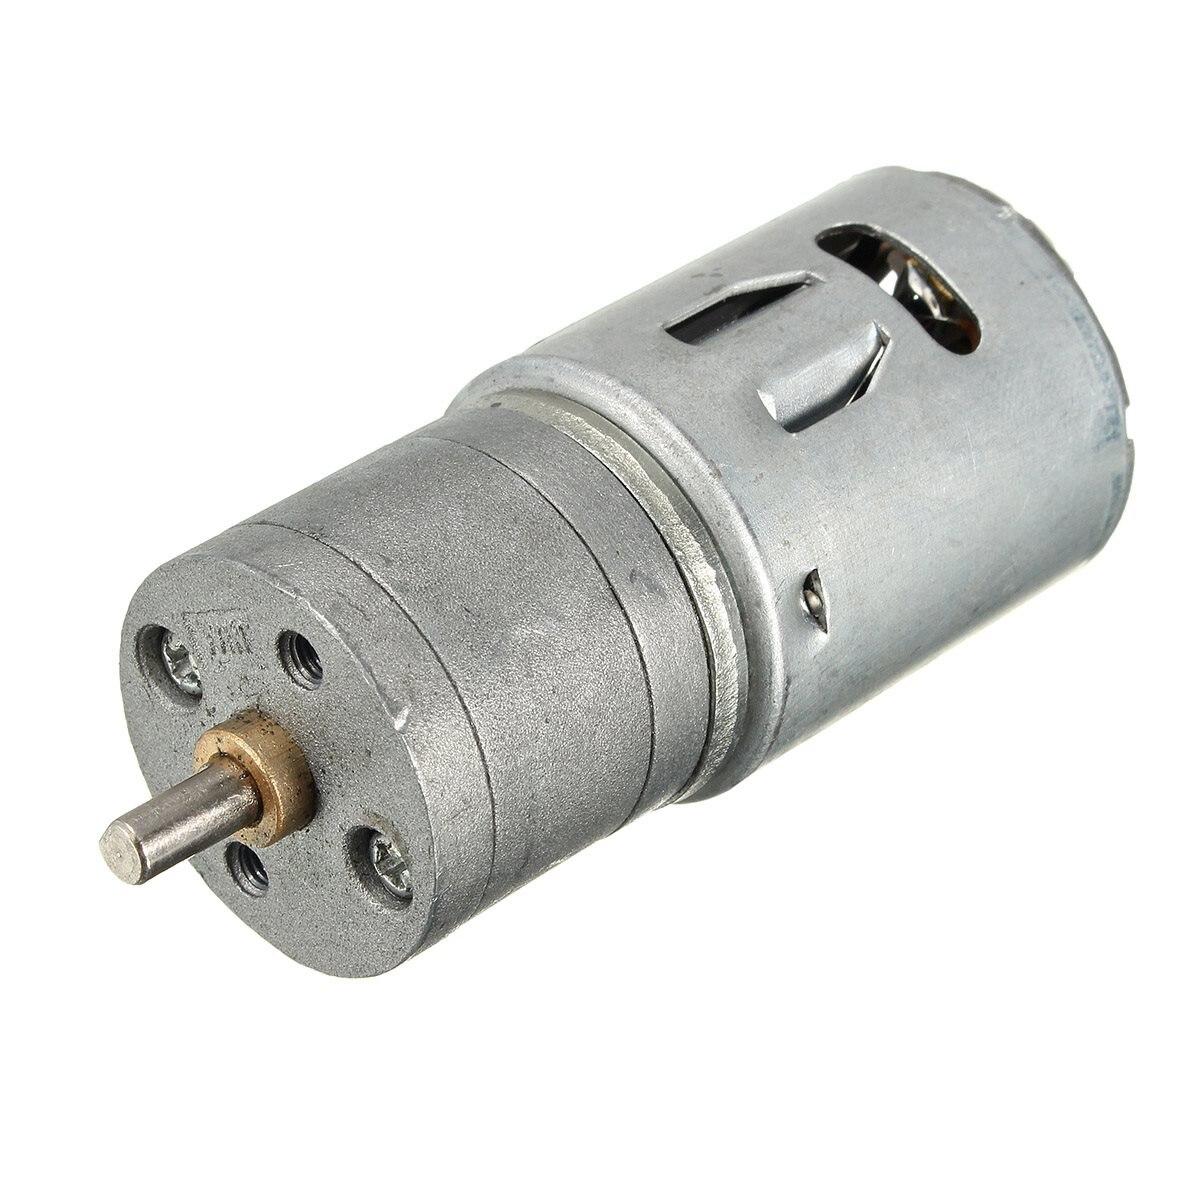 12v 6v Dc 100rpm Powerful Torque Micro Speed Reduction